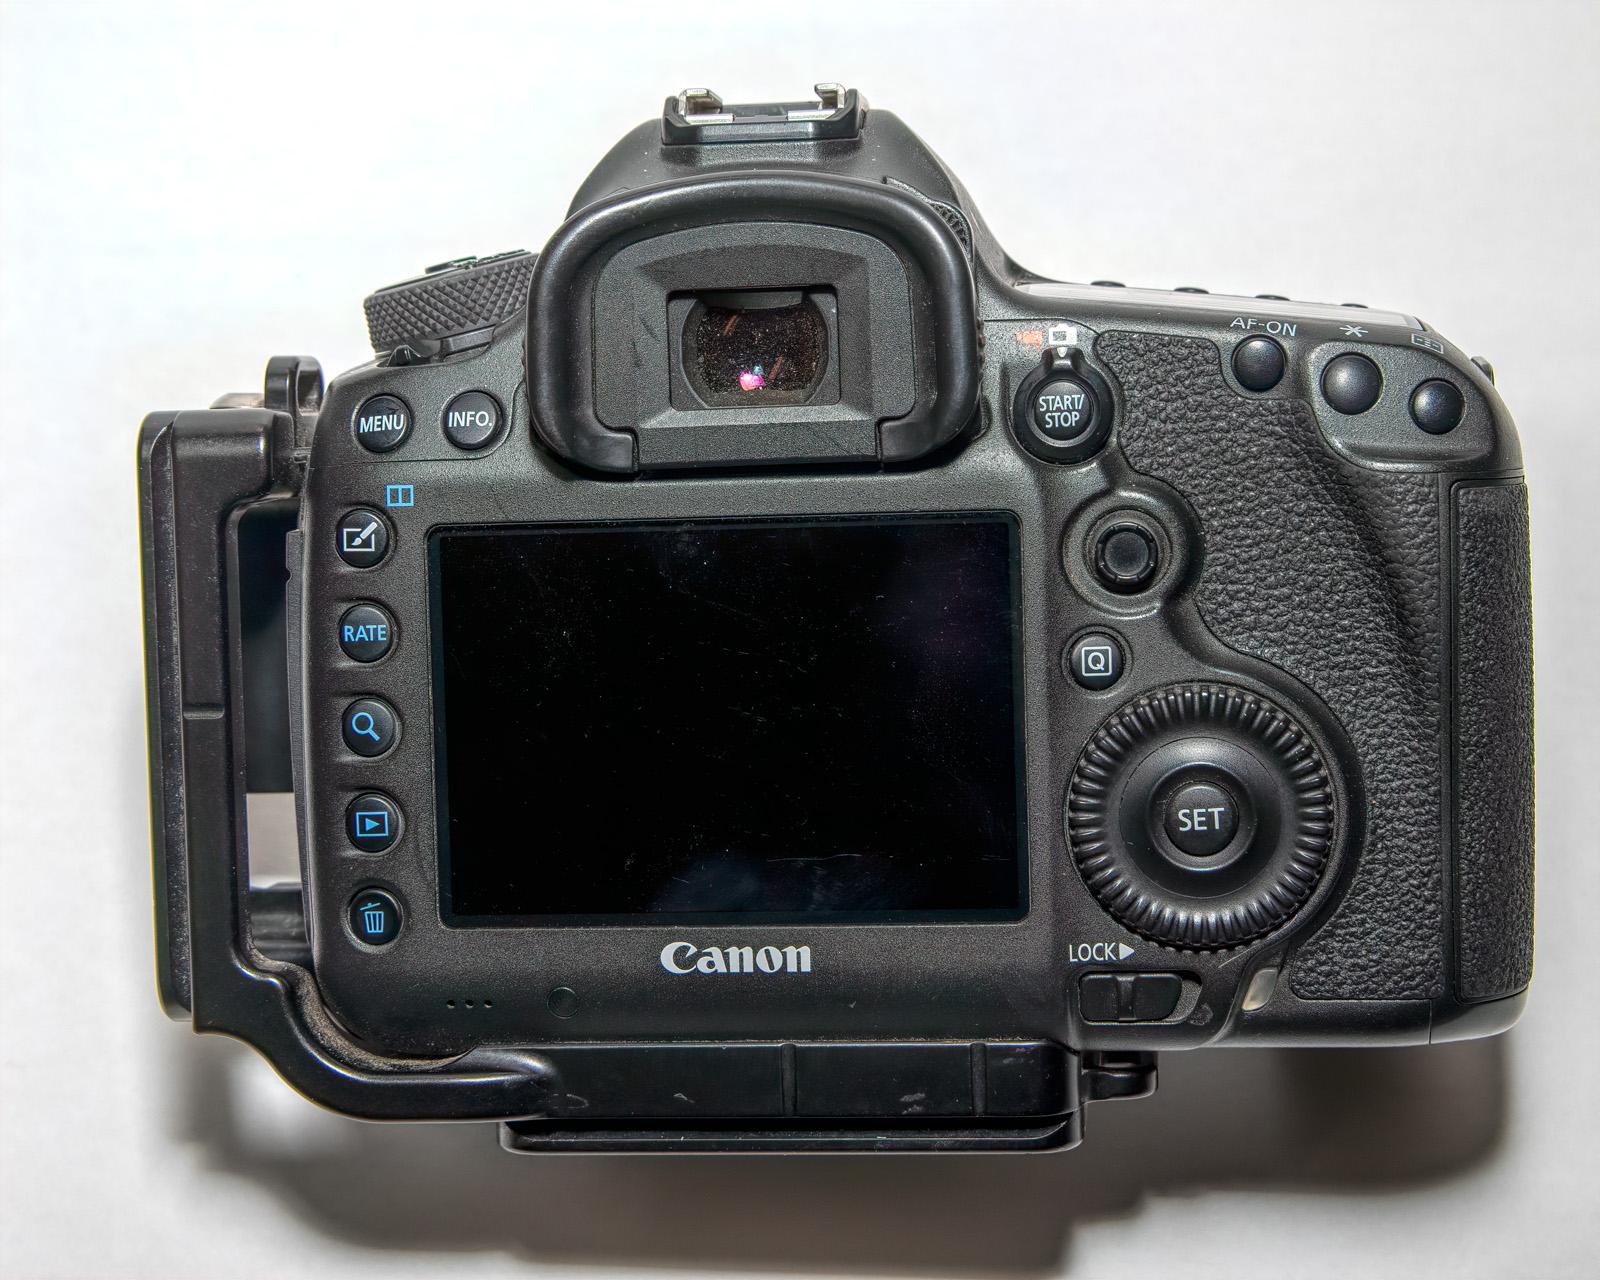 201210-548-R5.jpg